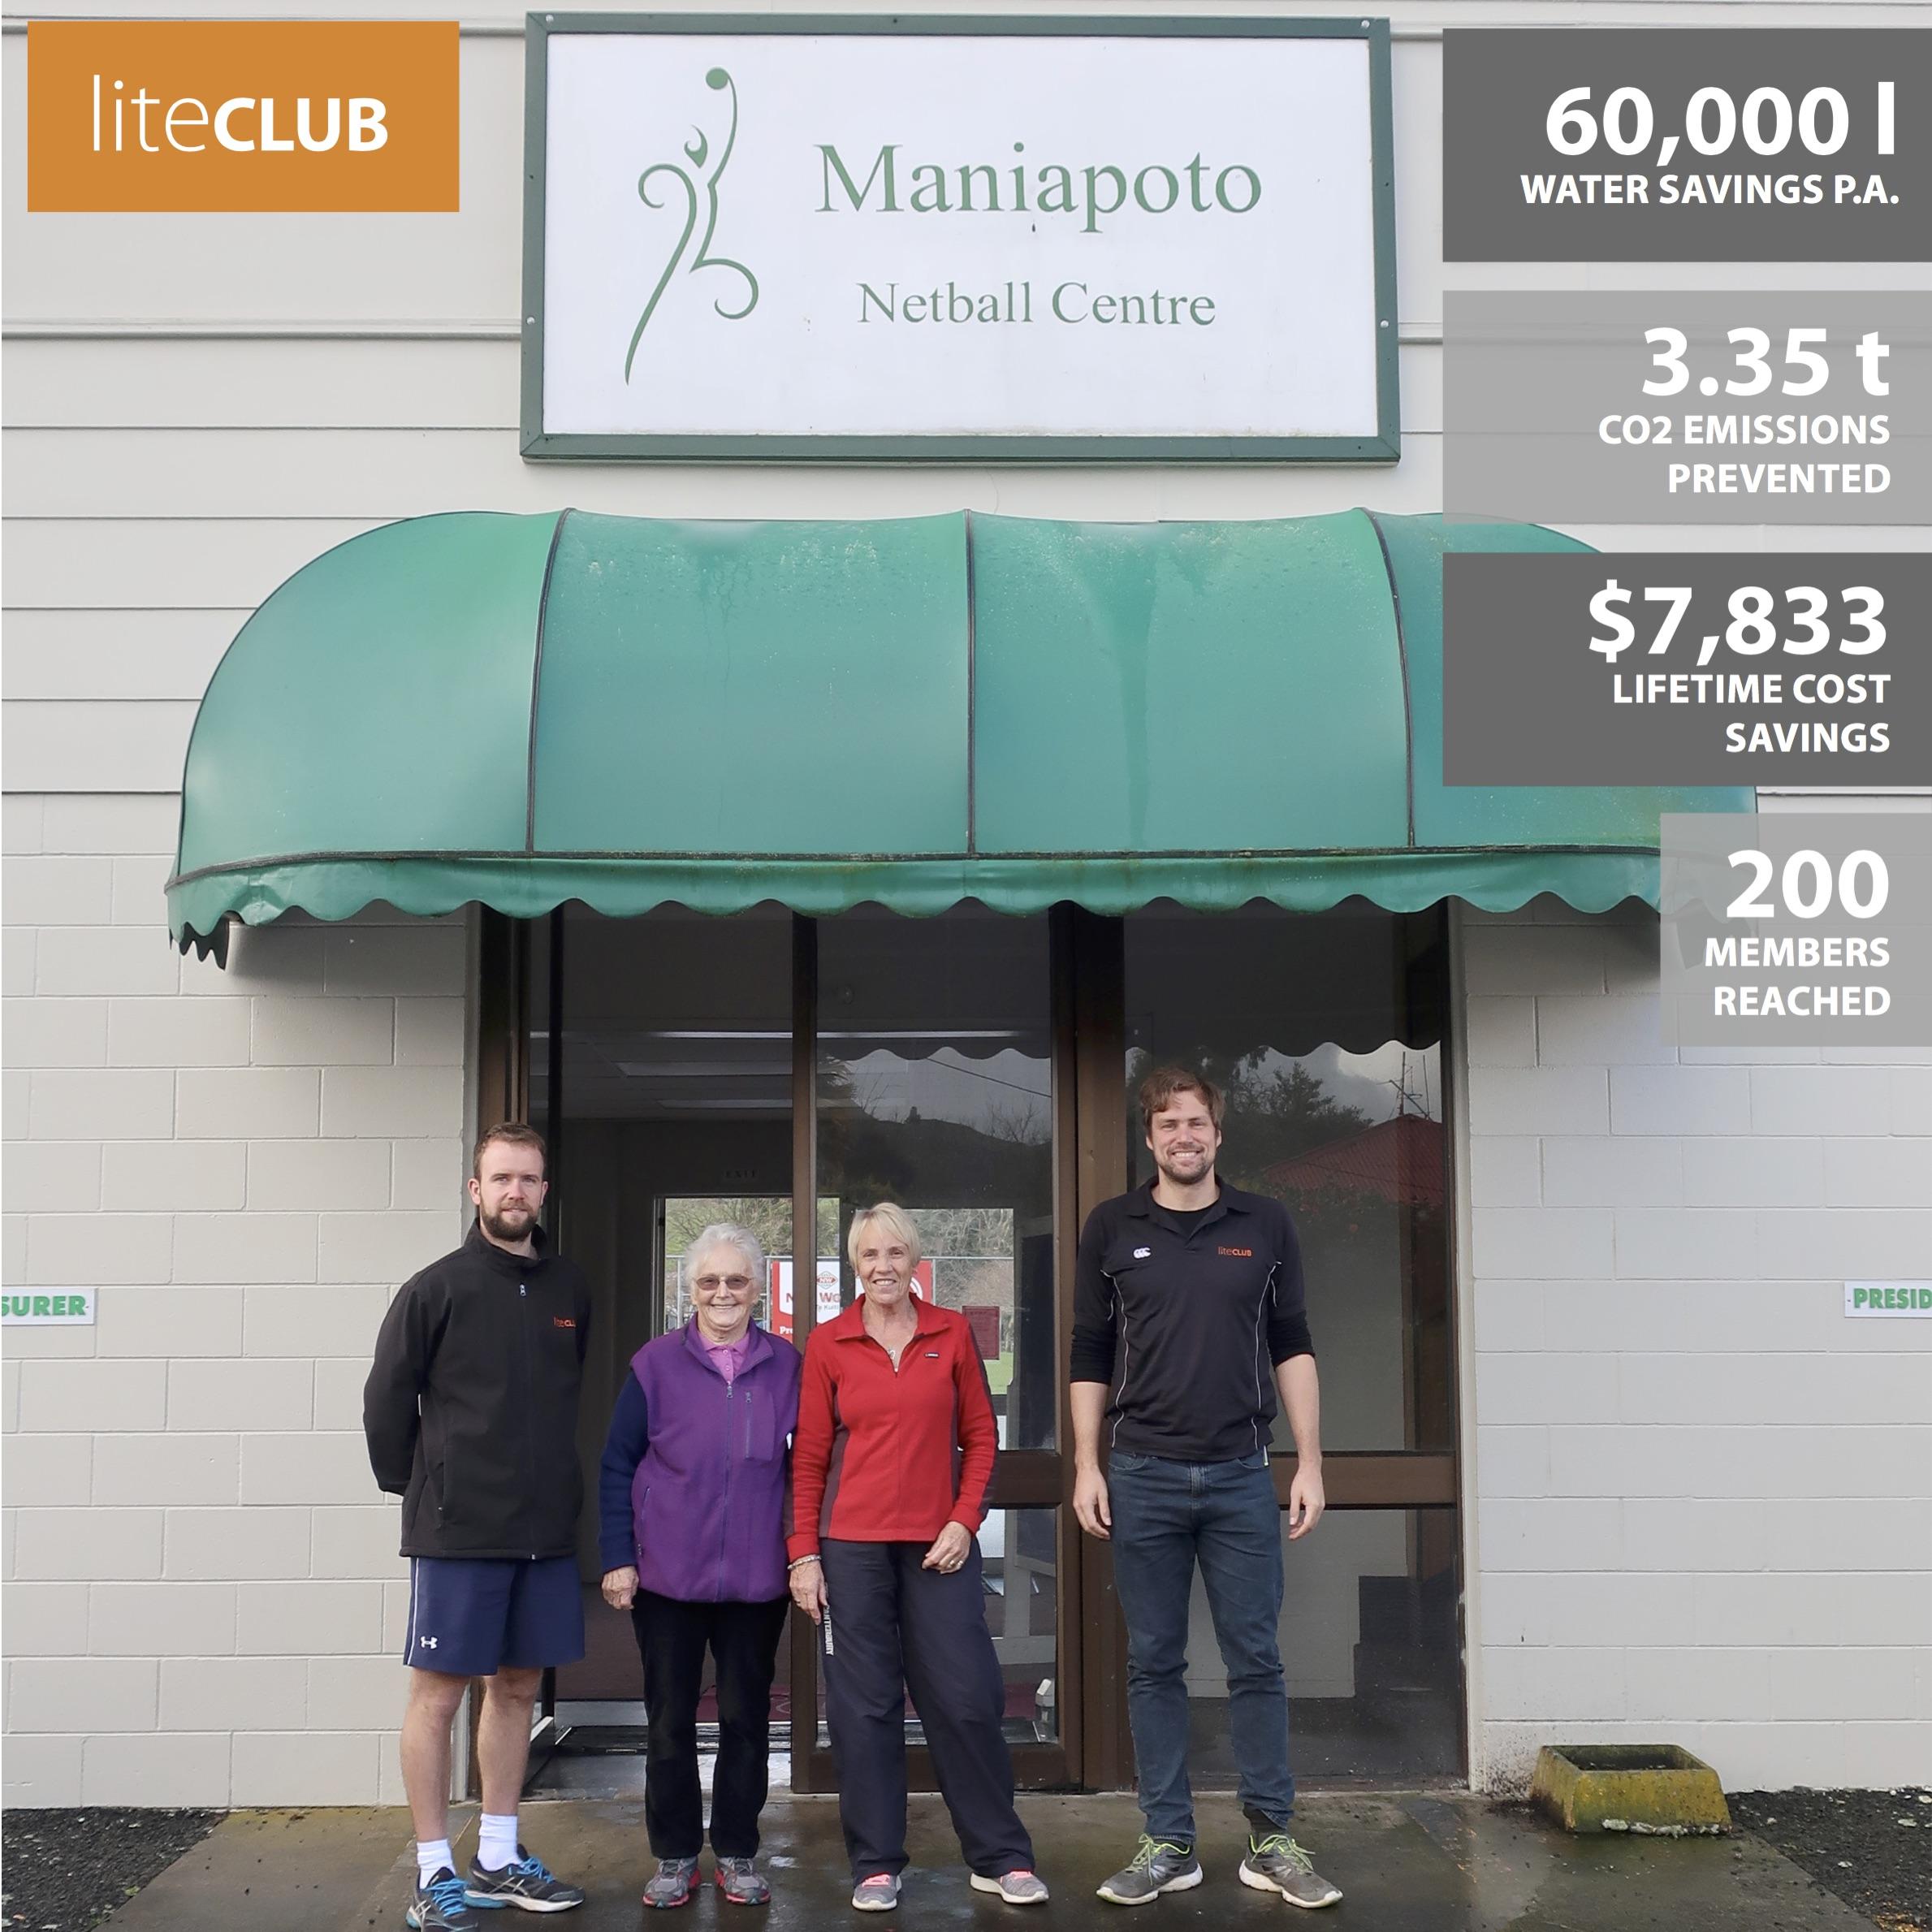 Maniapoto Netball Centre